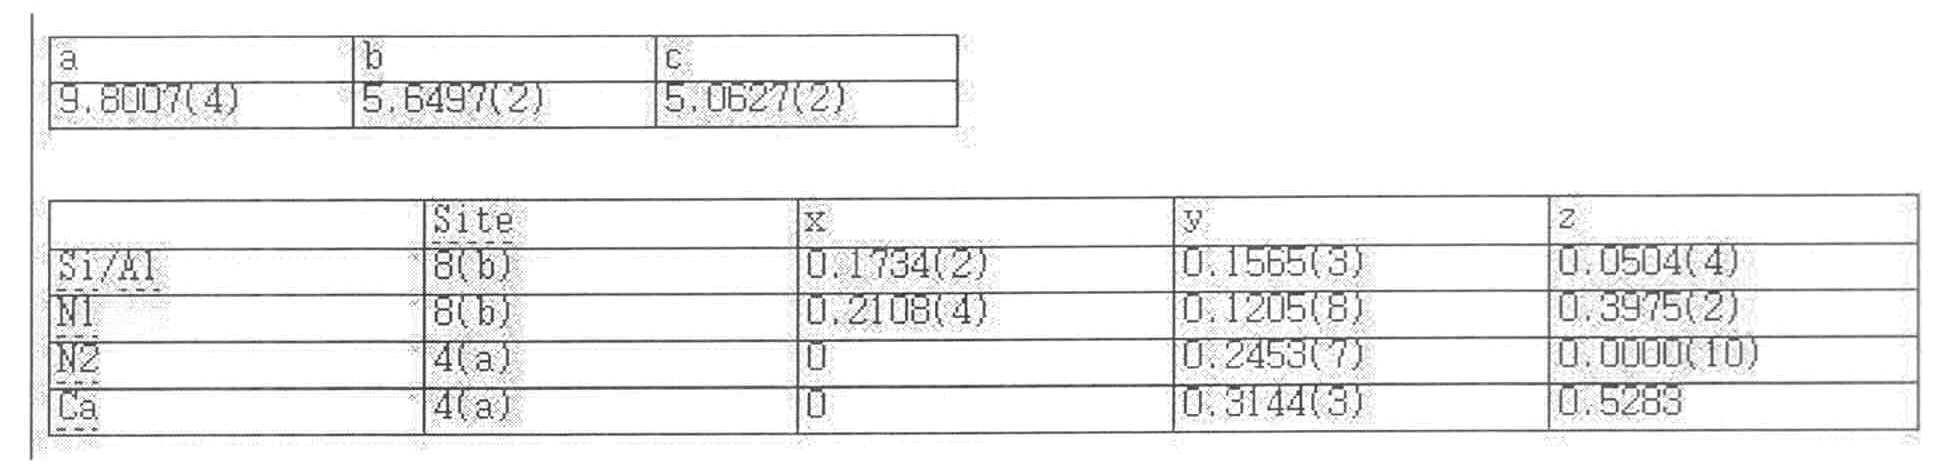 Figure 112012500366502-pct00062